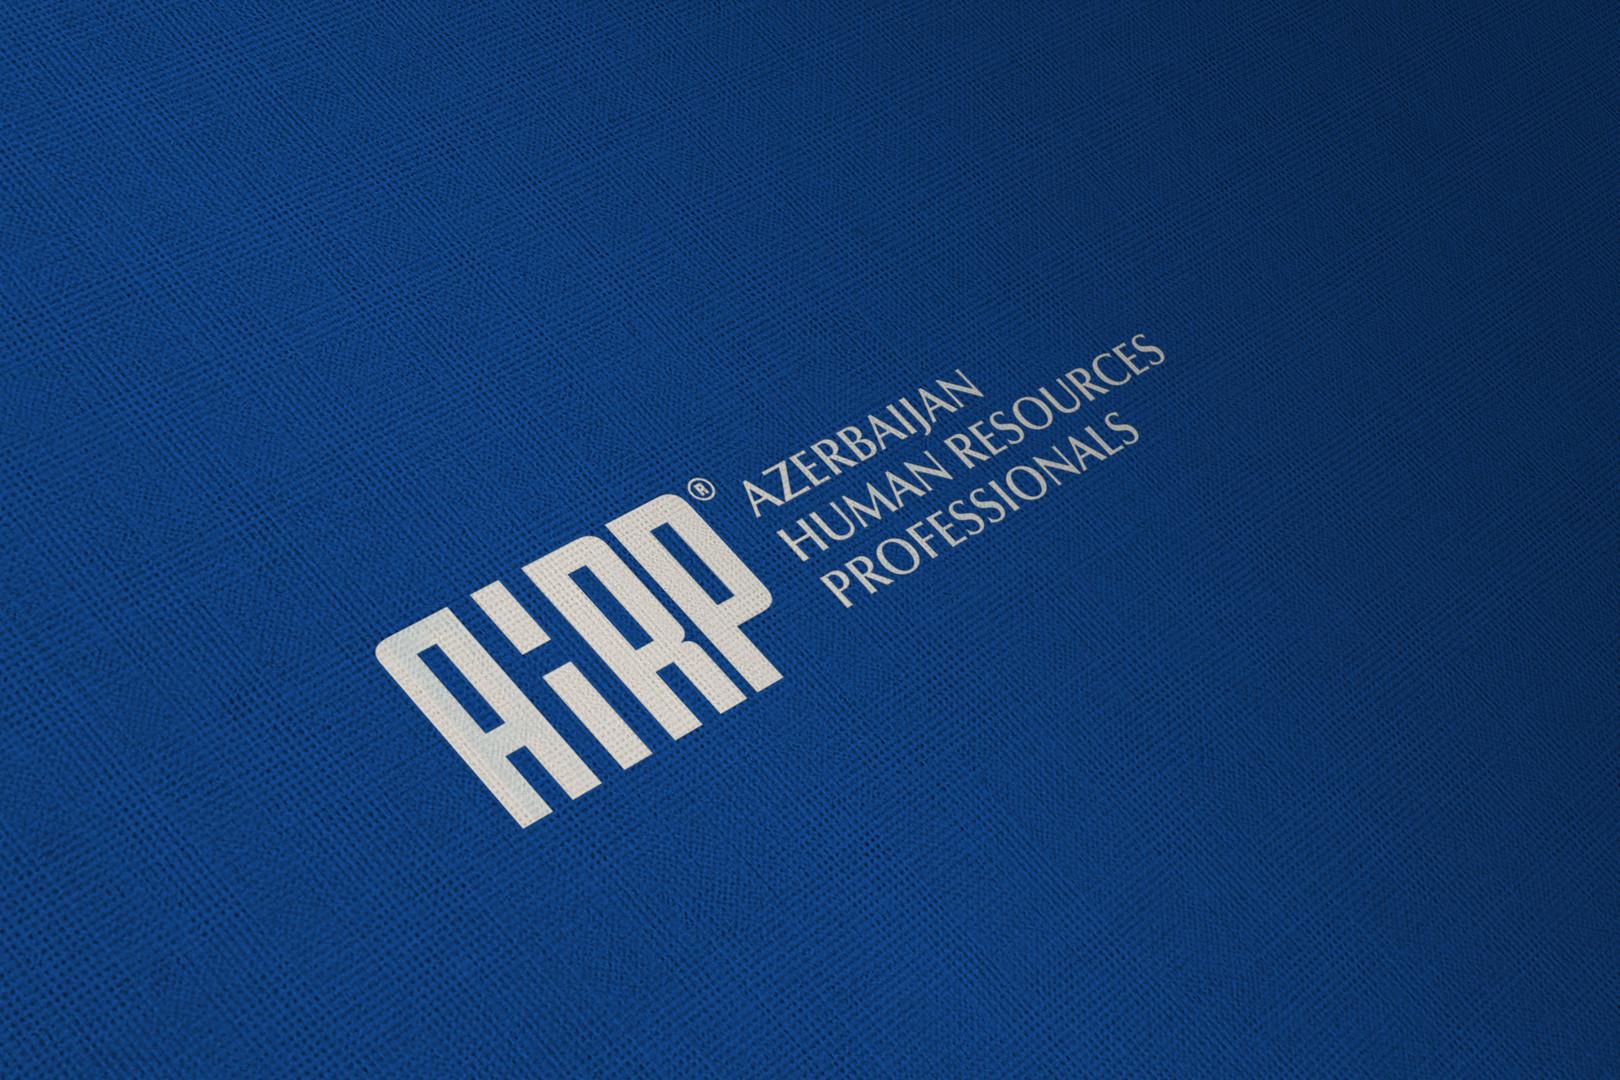 AHRP_logo press.jpg